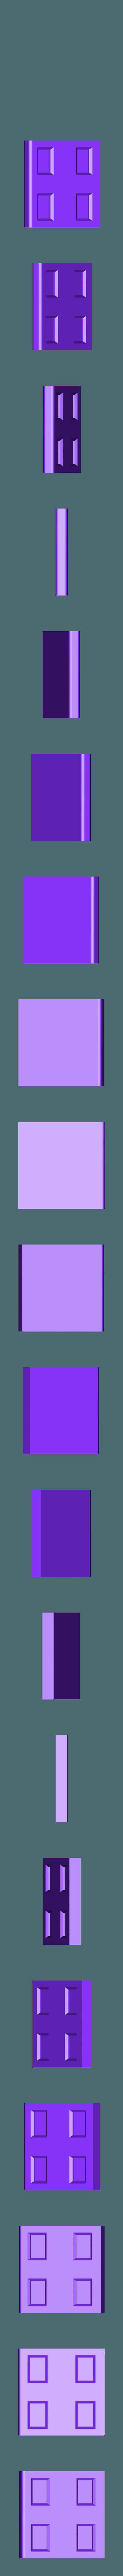 window_1.stl Download STL file SD card storage • 3D printing model, Florisam